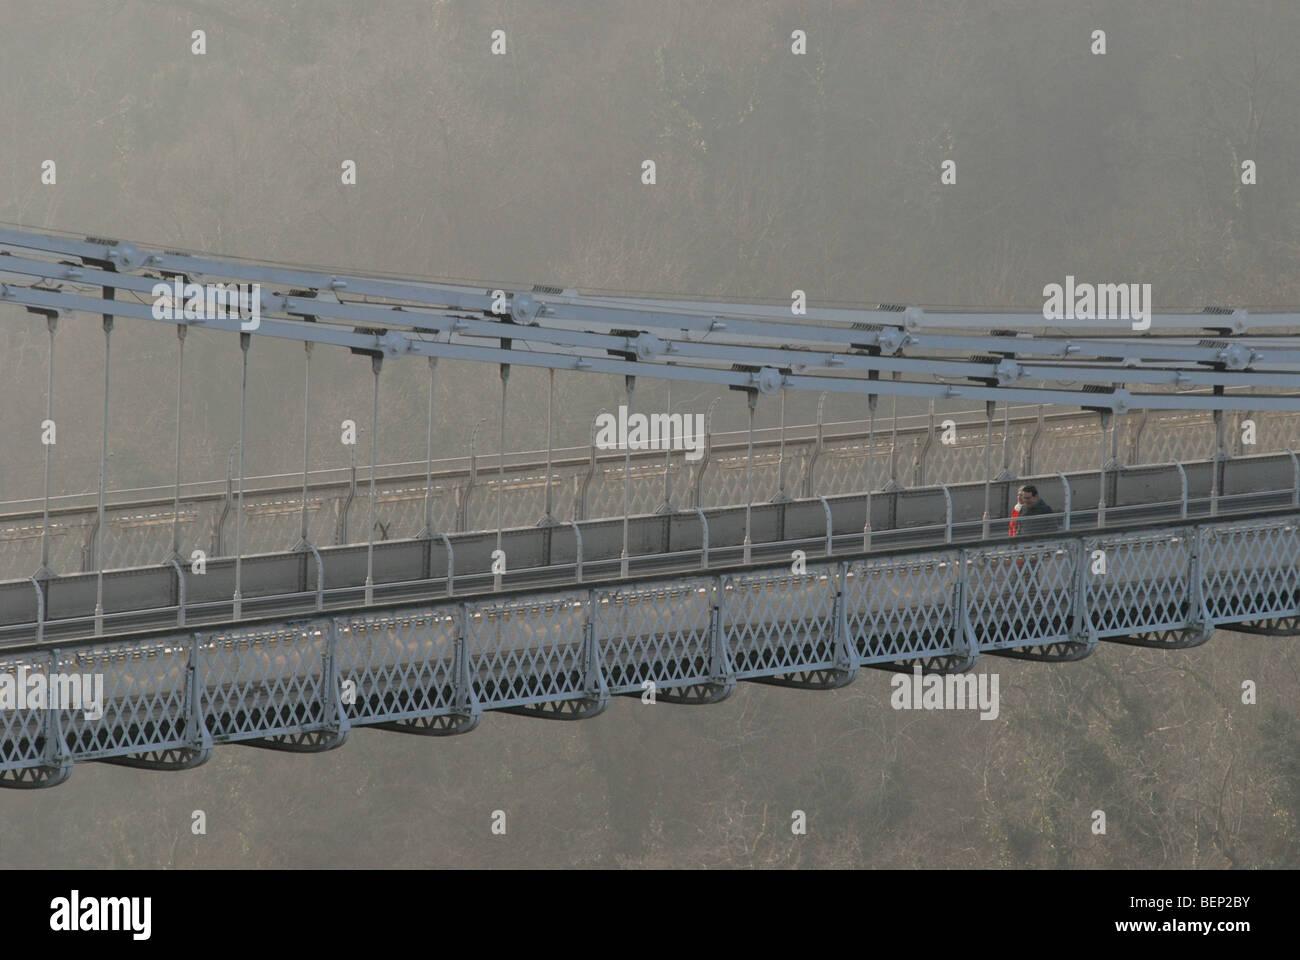 The Clifton Suspension Bridge over the River Avon, Bristol, UK. - Stock Image